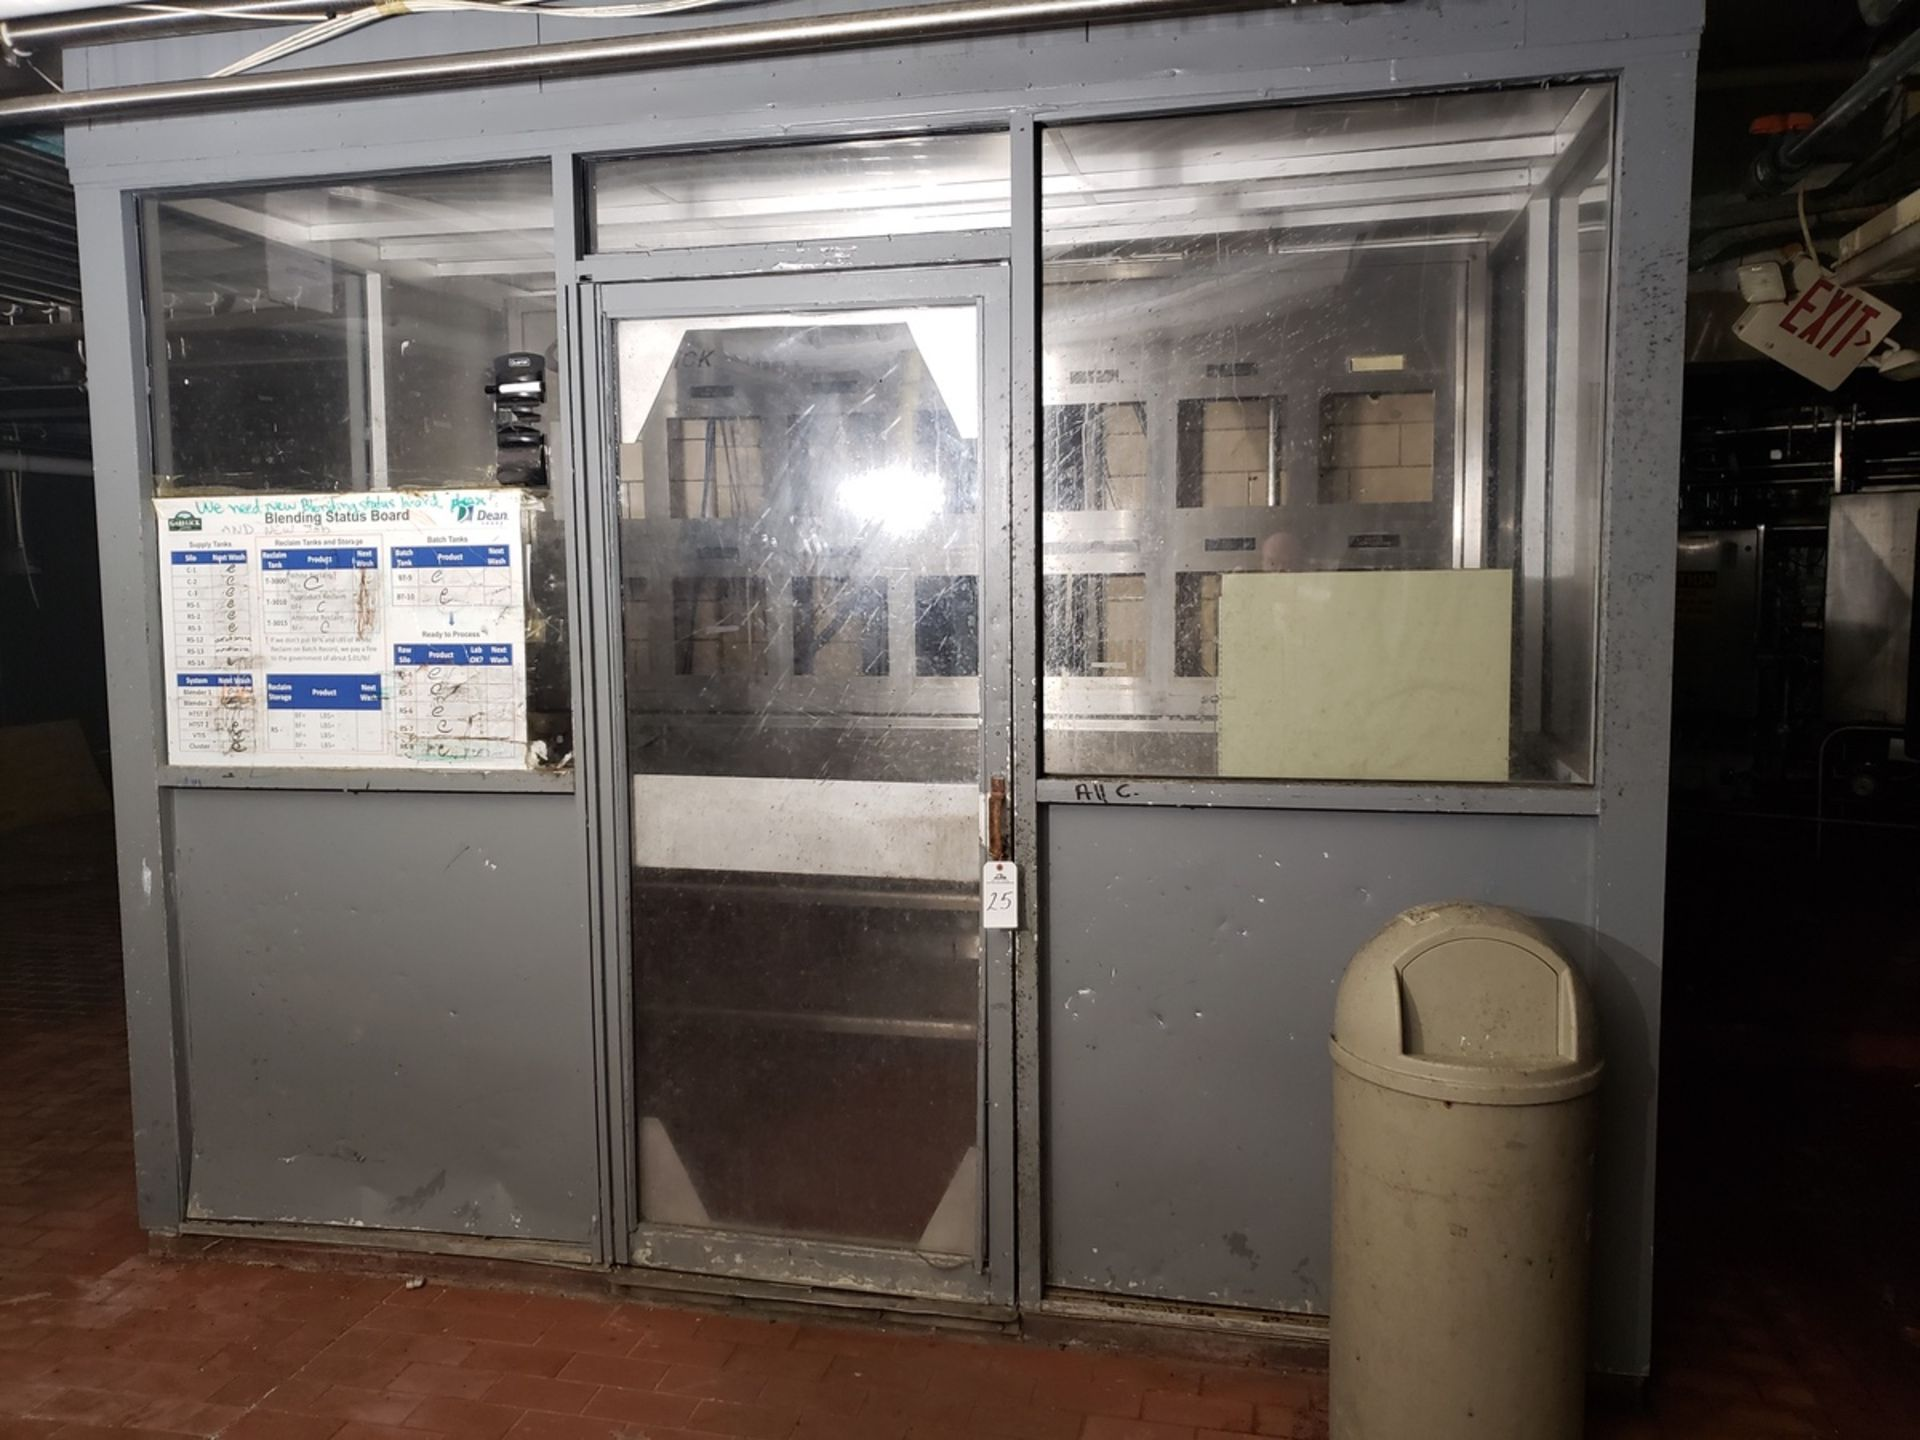 Lot 25 - Garelick Control Shed | Rig Fee: $1800